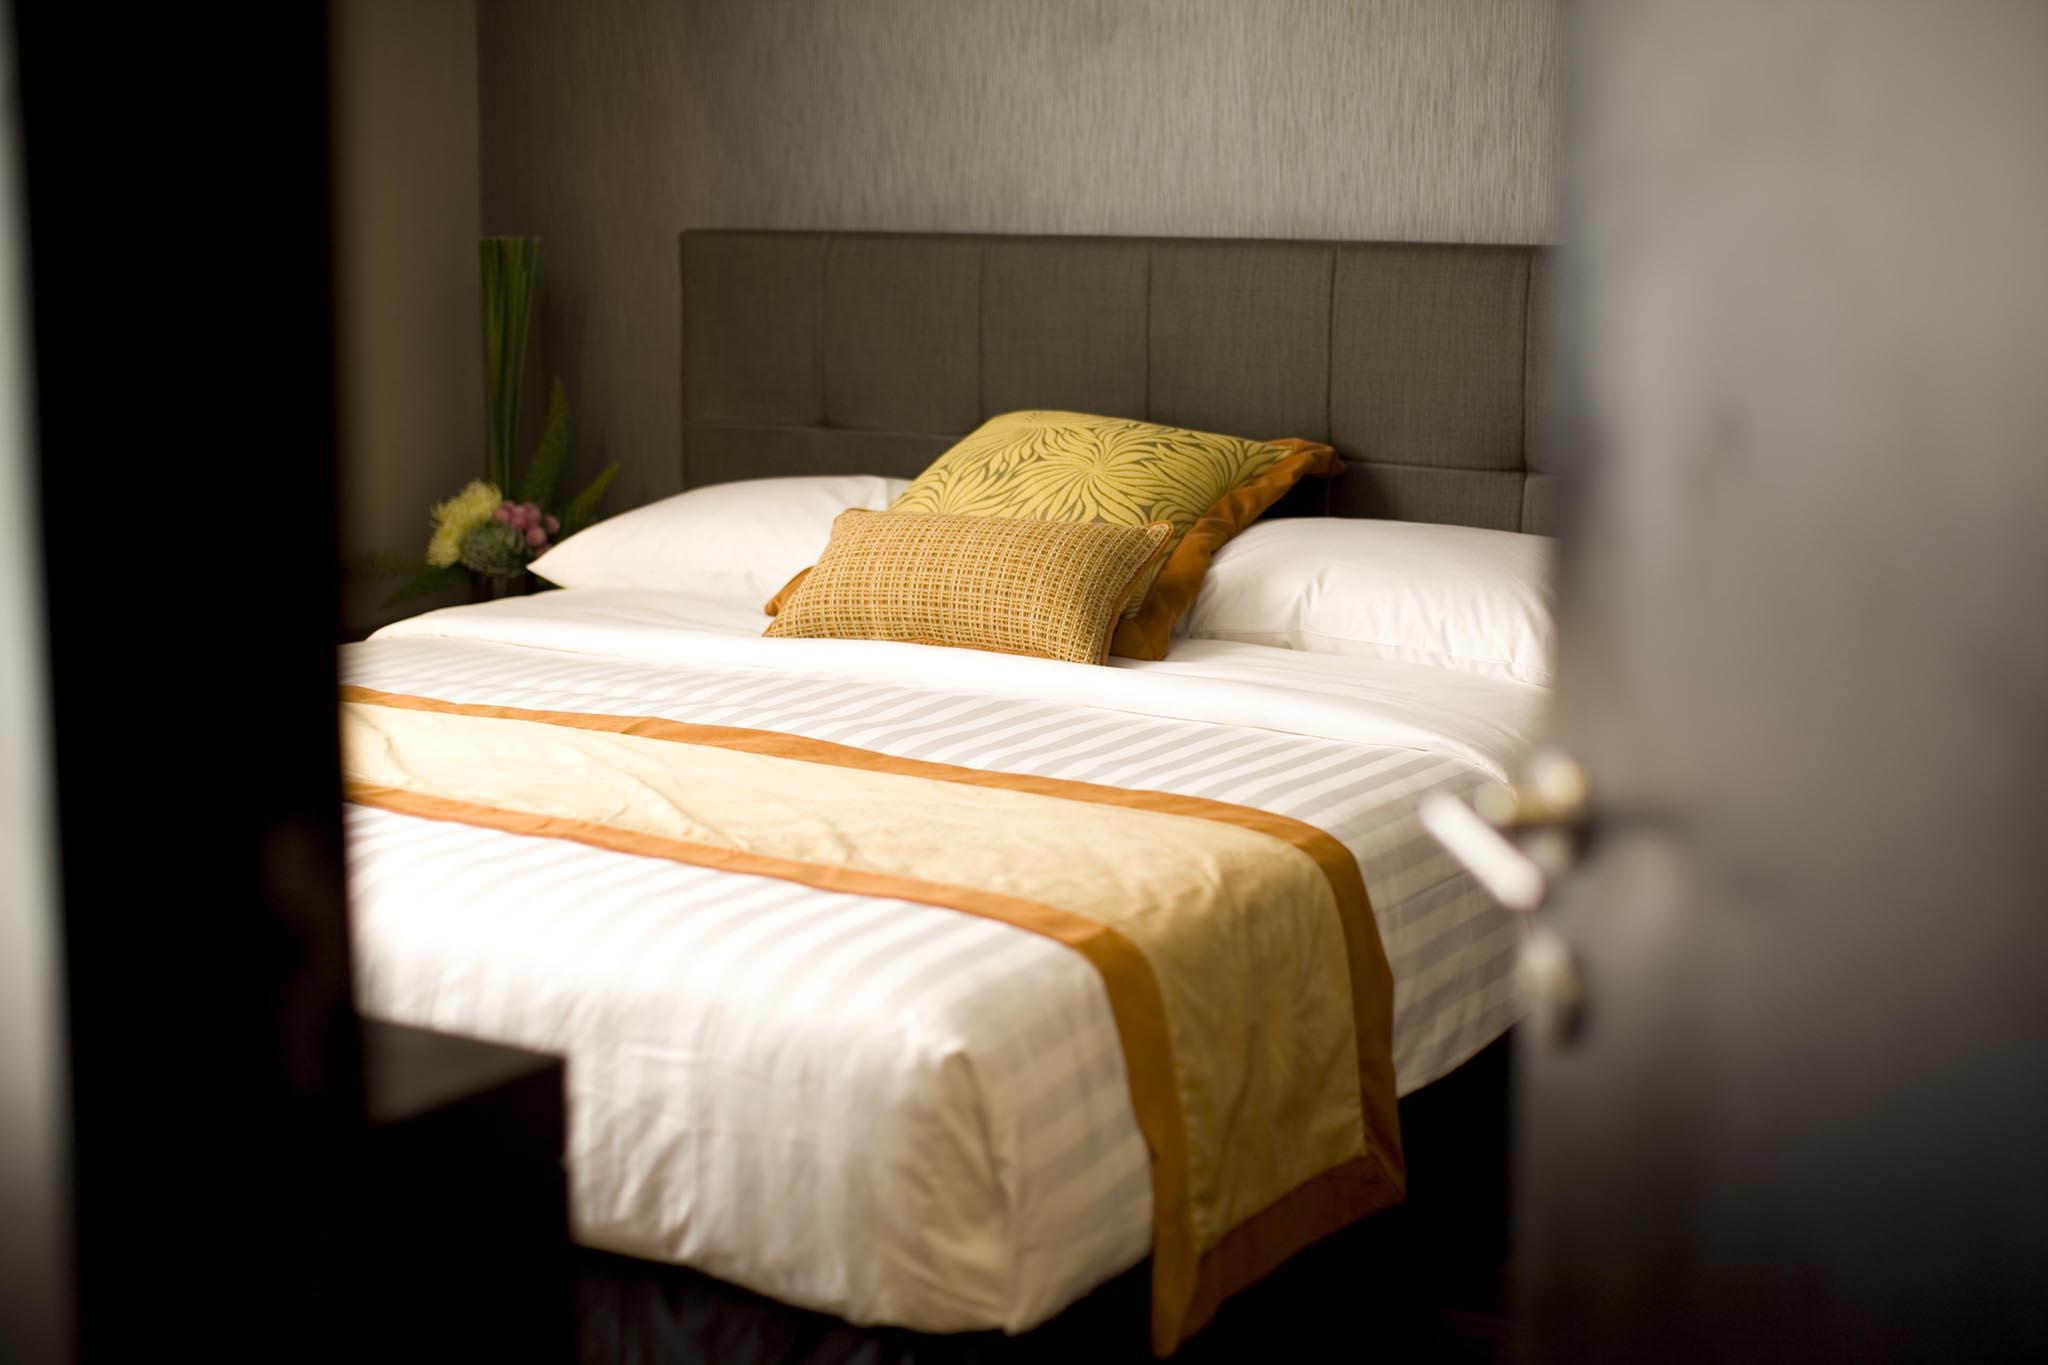 Experience Serenity This Holy Week at F1 Hotel Manila